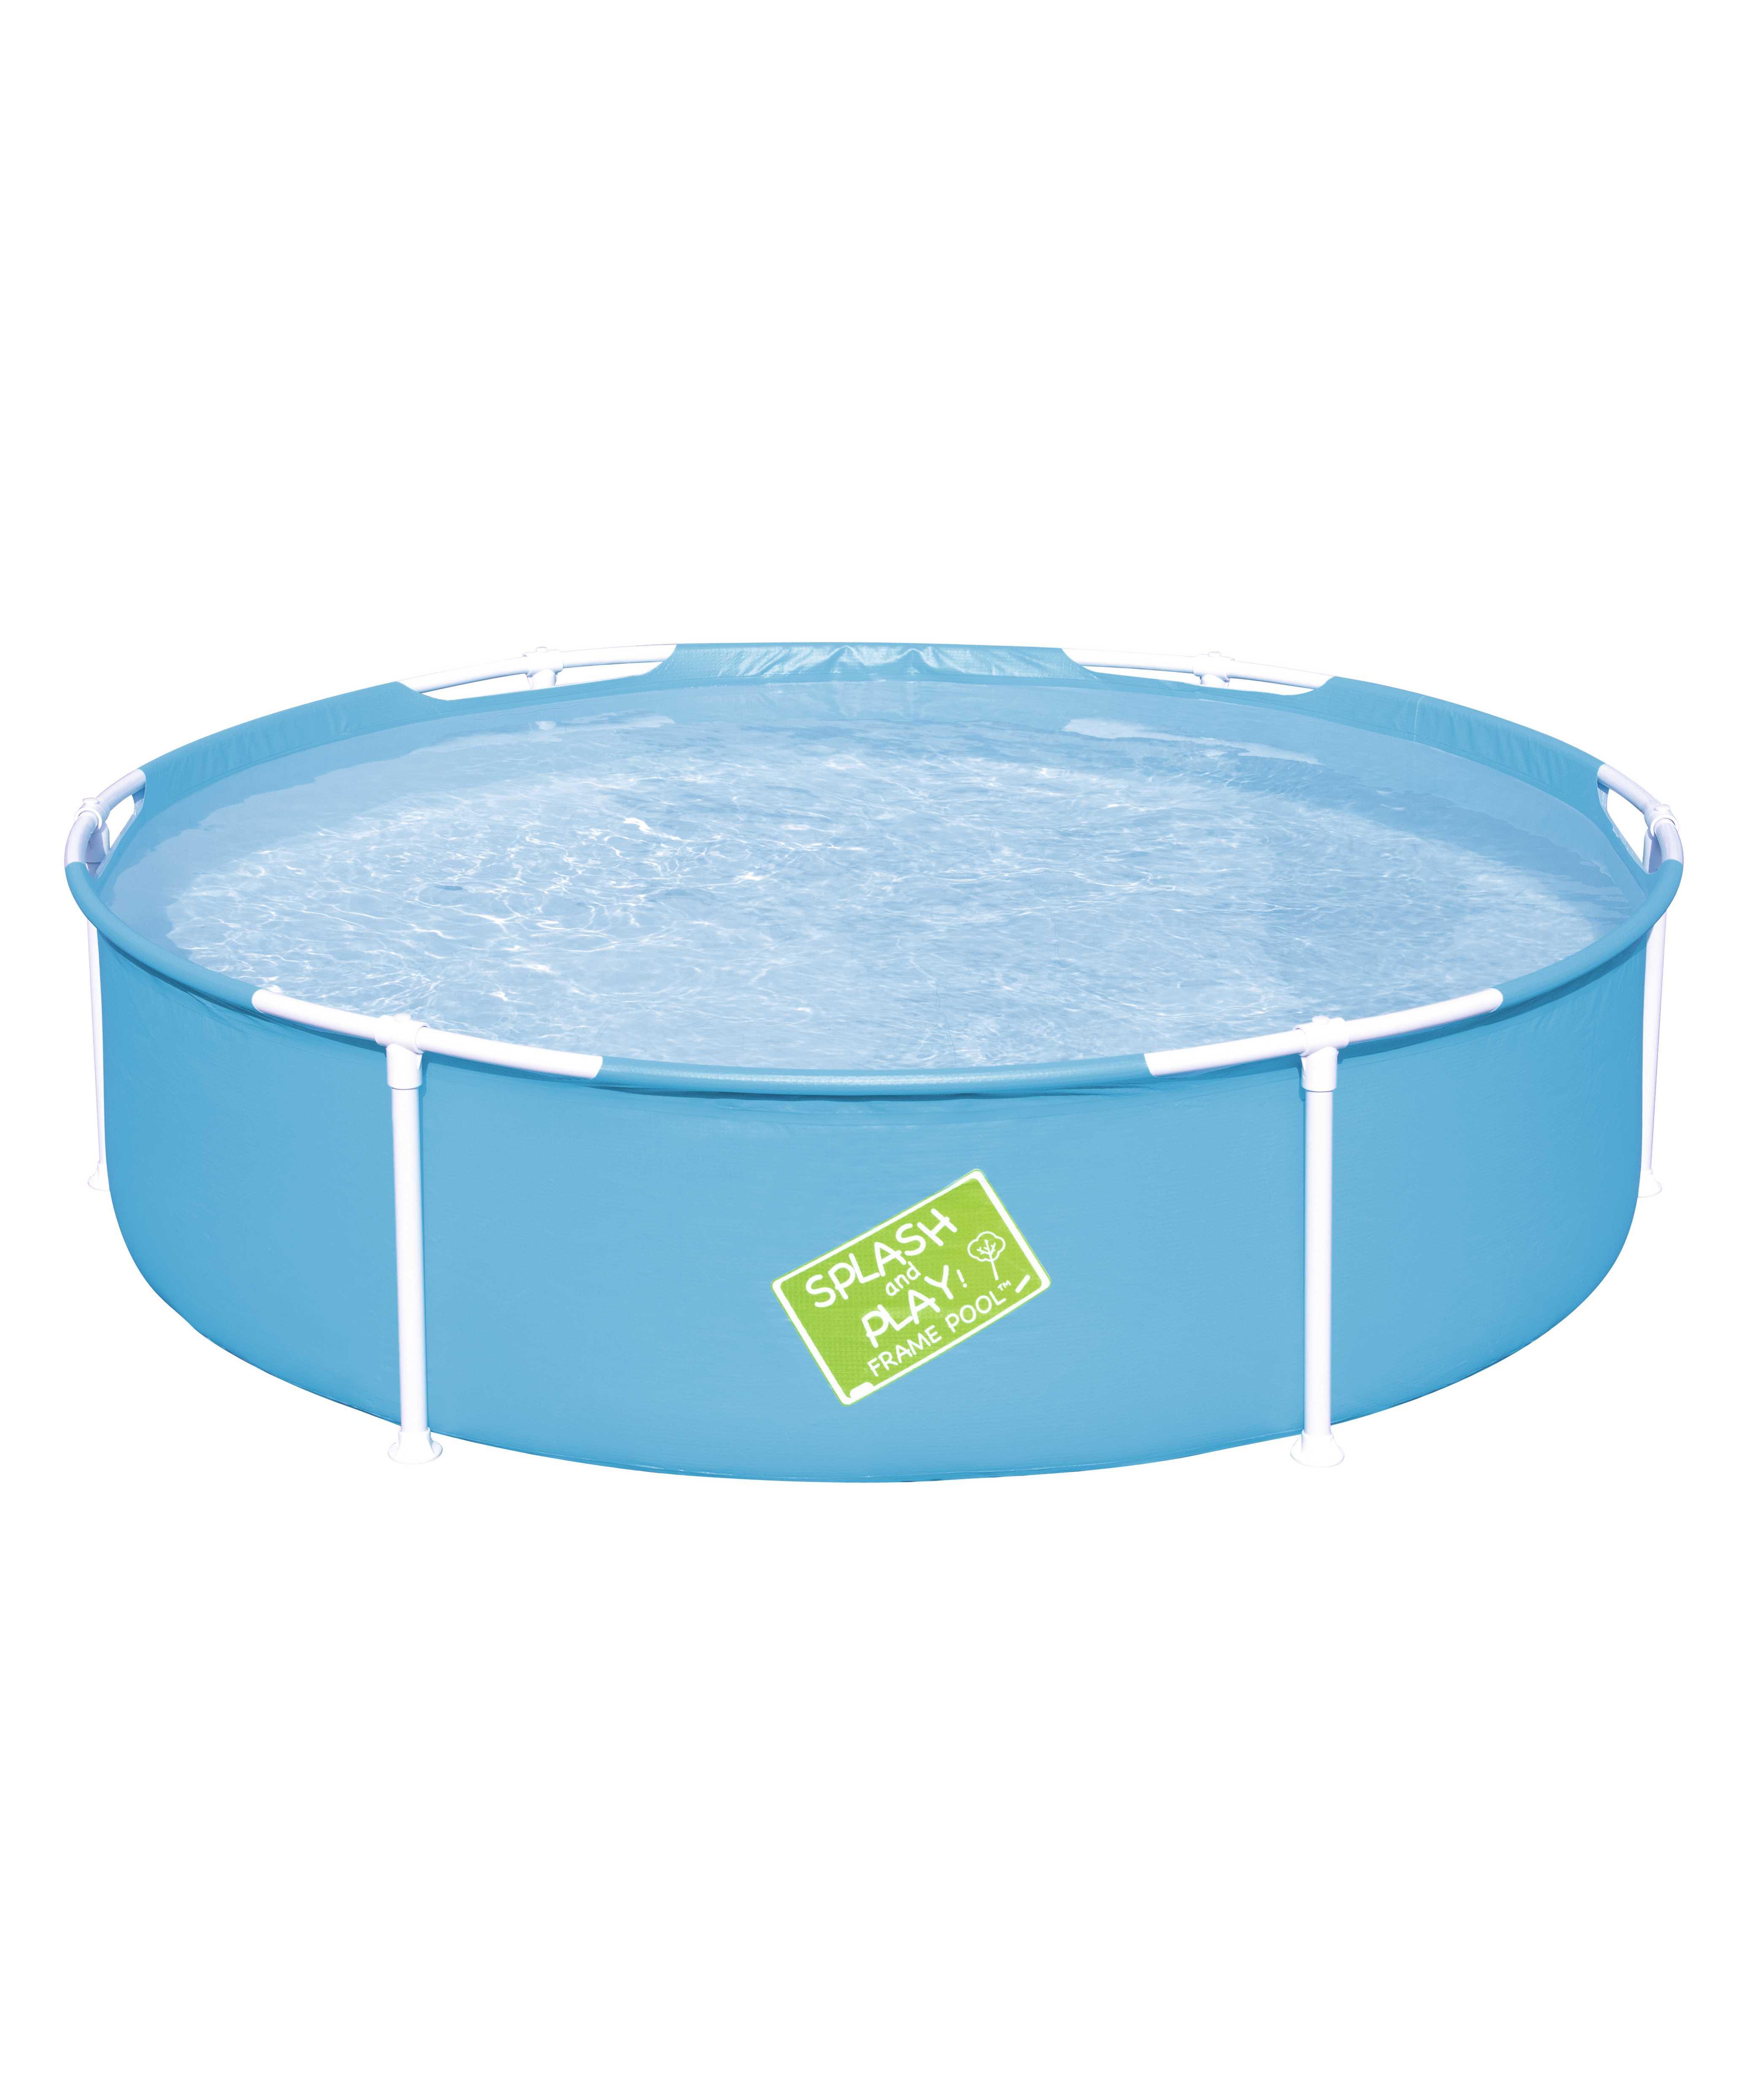 Scaffold Round Basin 152 х38 Cm, 580 L, For Children From 2 Years, Bestway, Item No. 56283